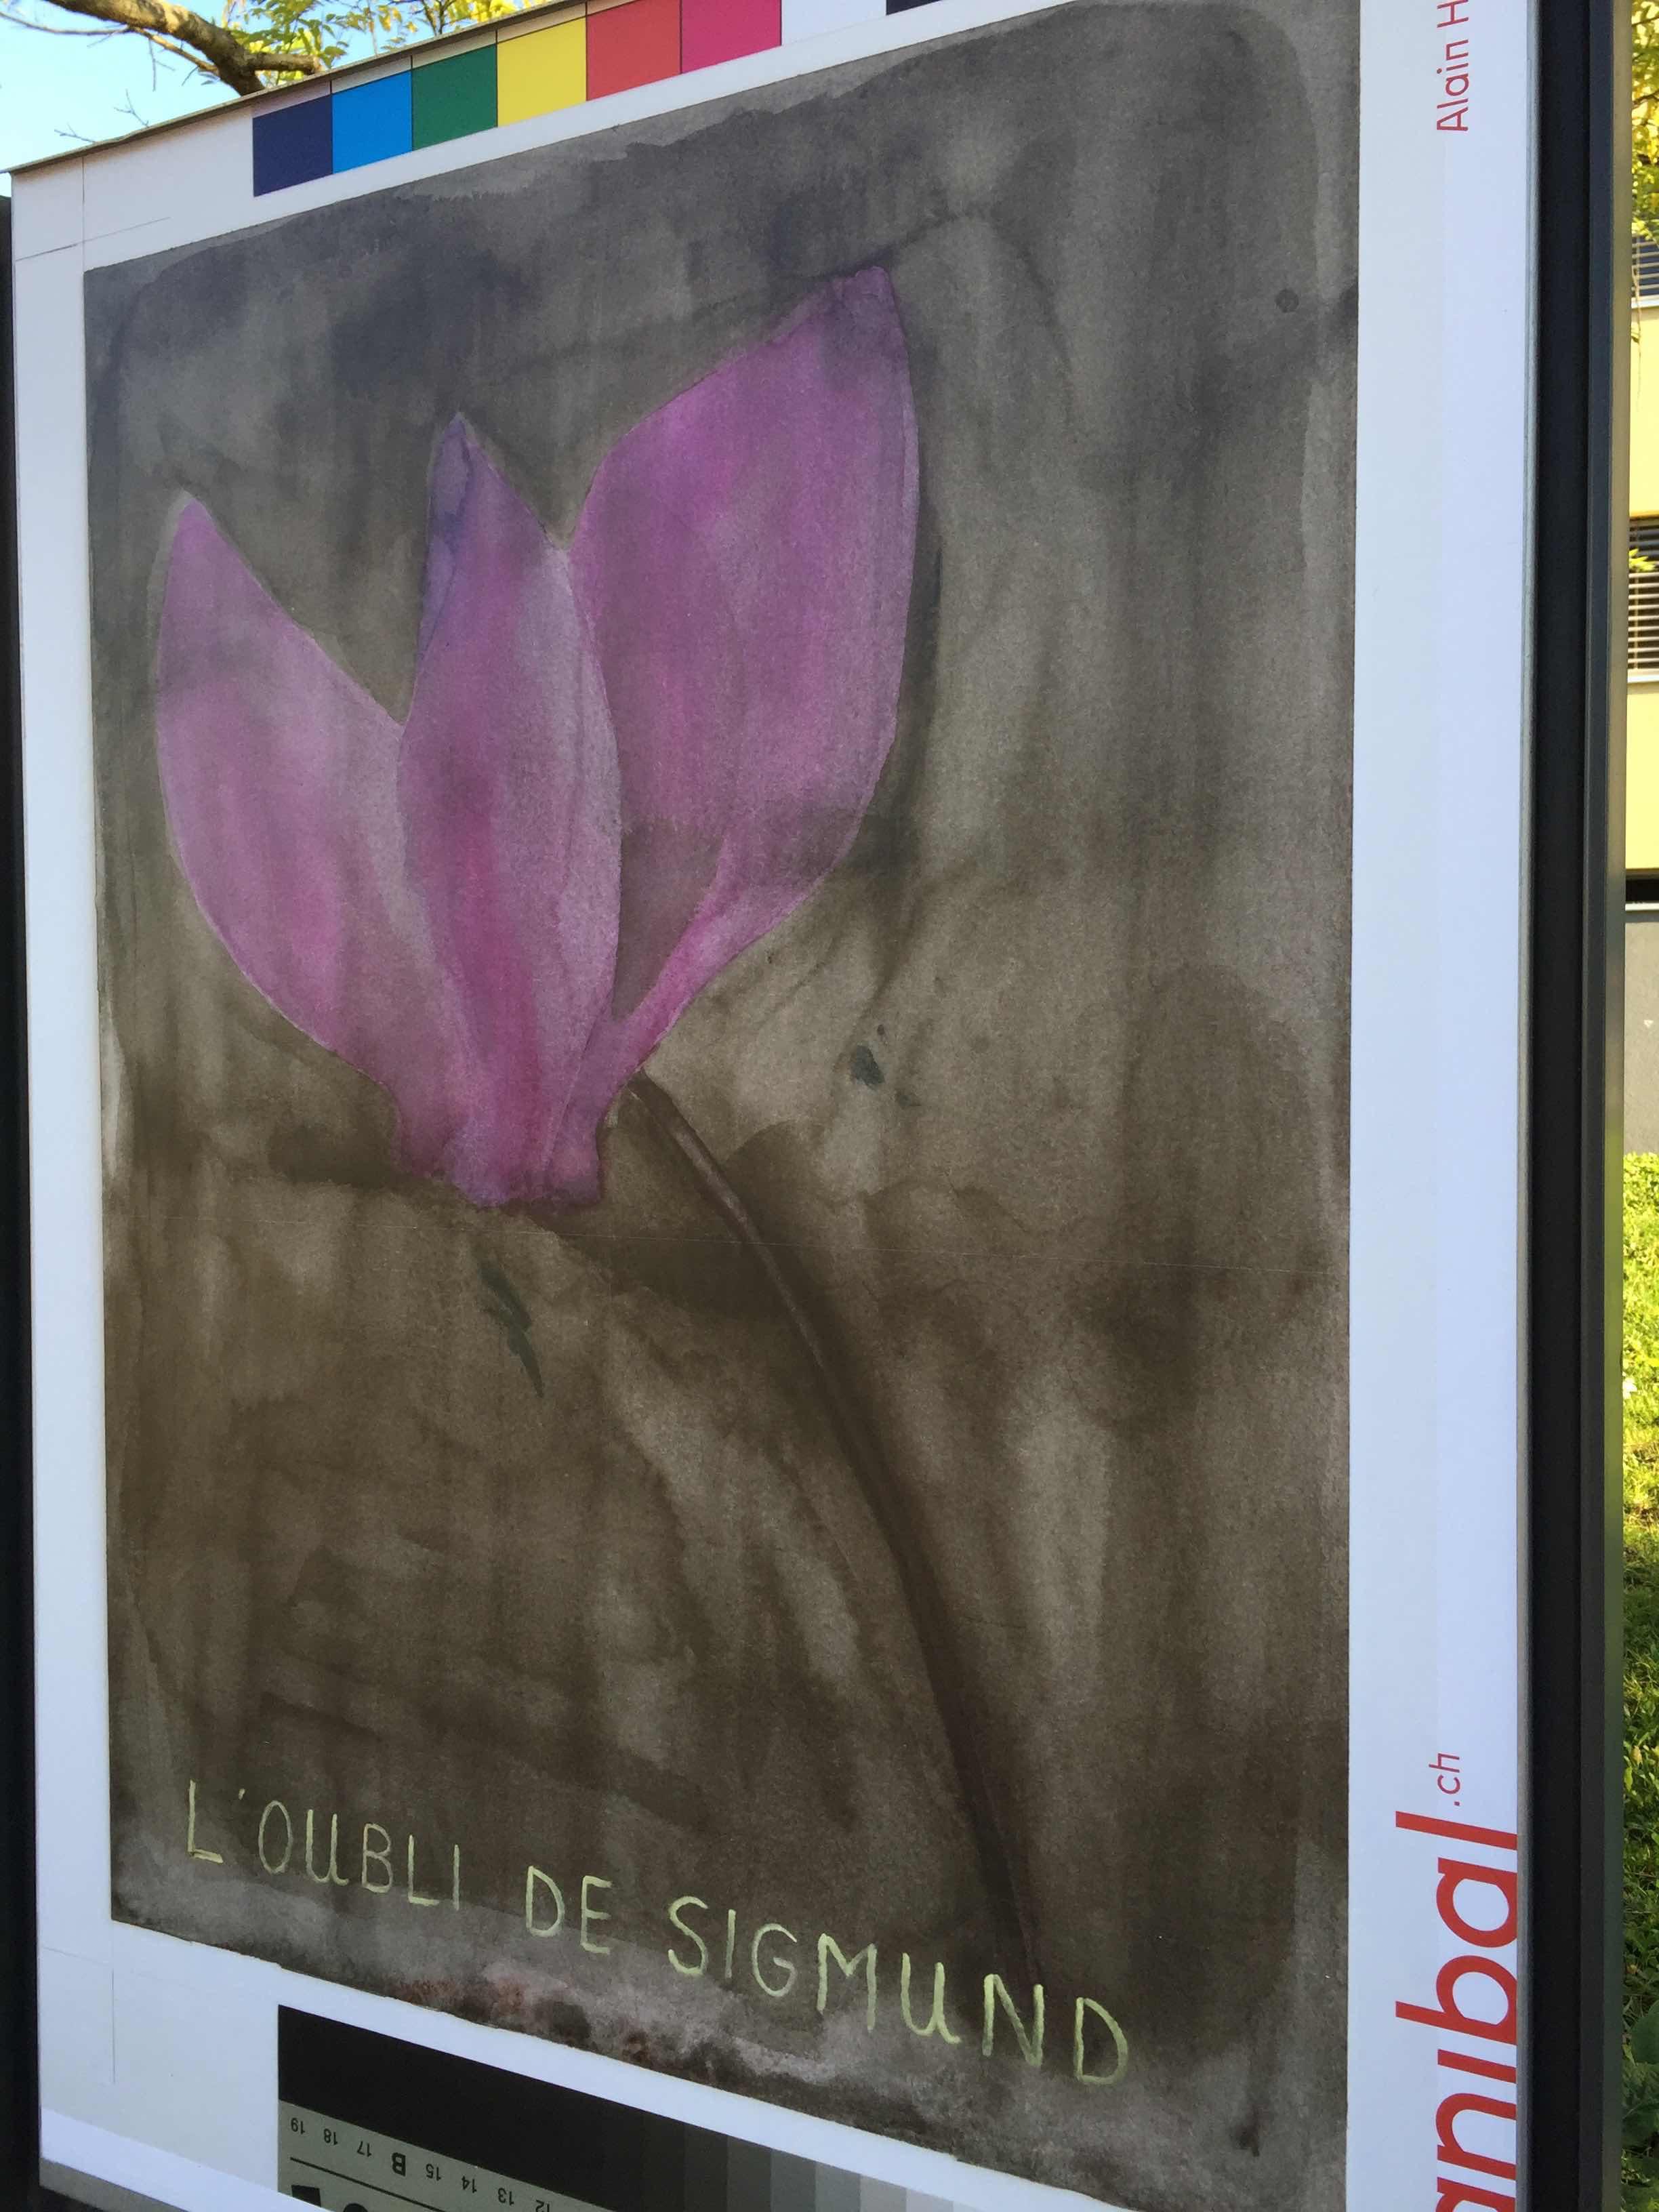 Alain Huck, avenue de provence 51, Lausanne-IMG_5941